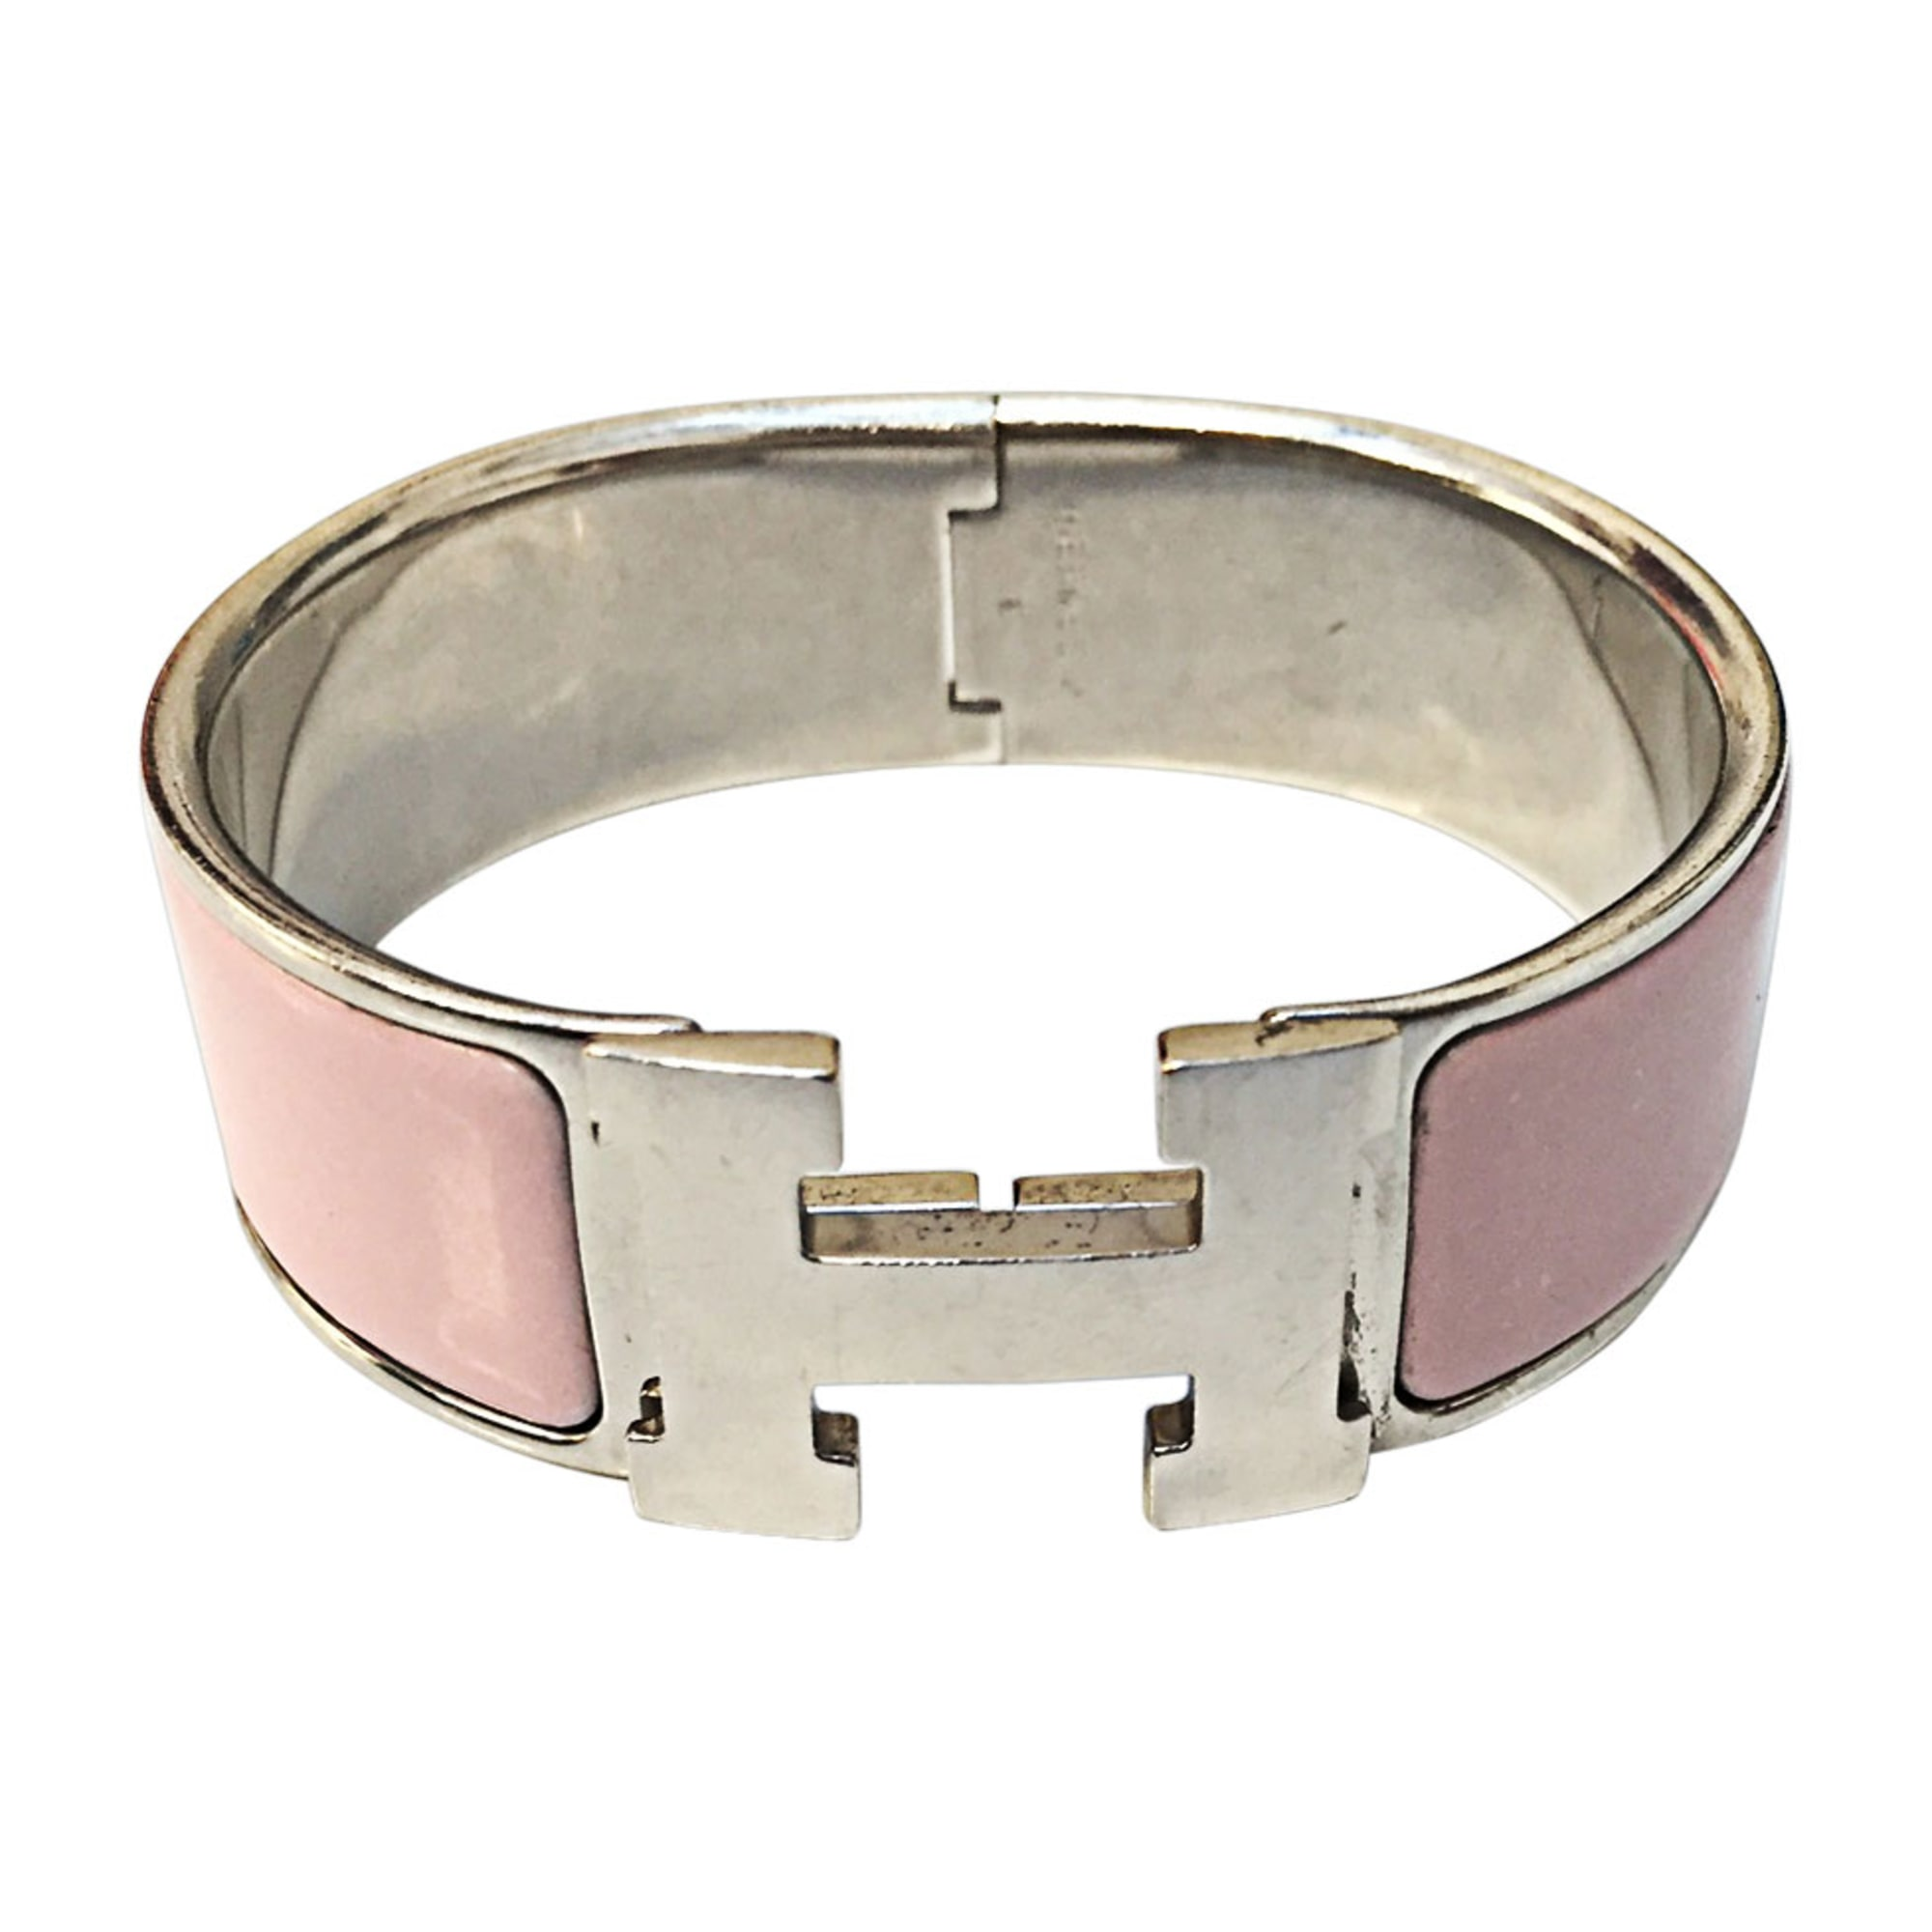 ac4dc11a6e17 Bracelet HERMÈS clic h rose vendu par Matthieu1009 - 4614169